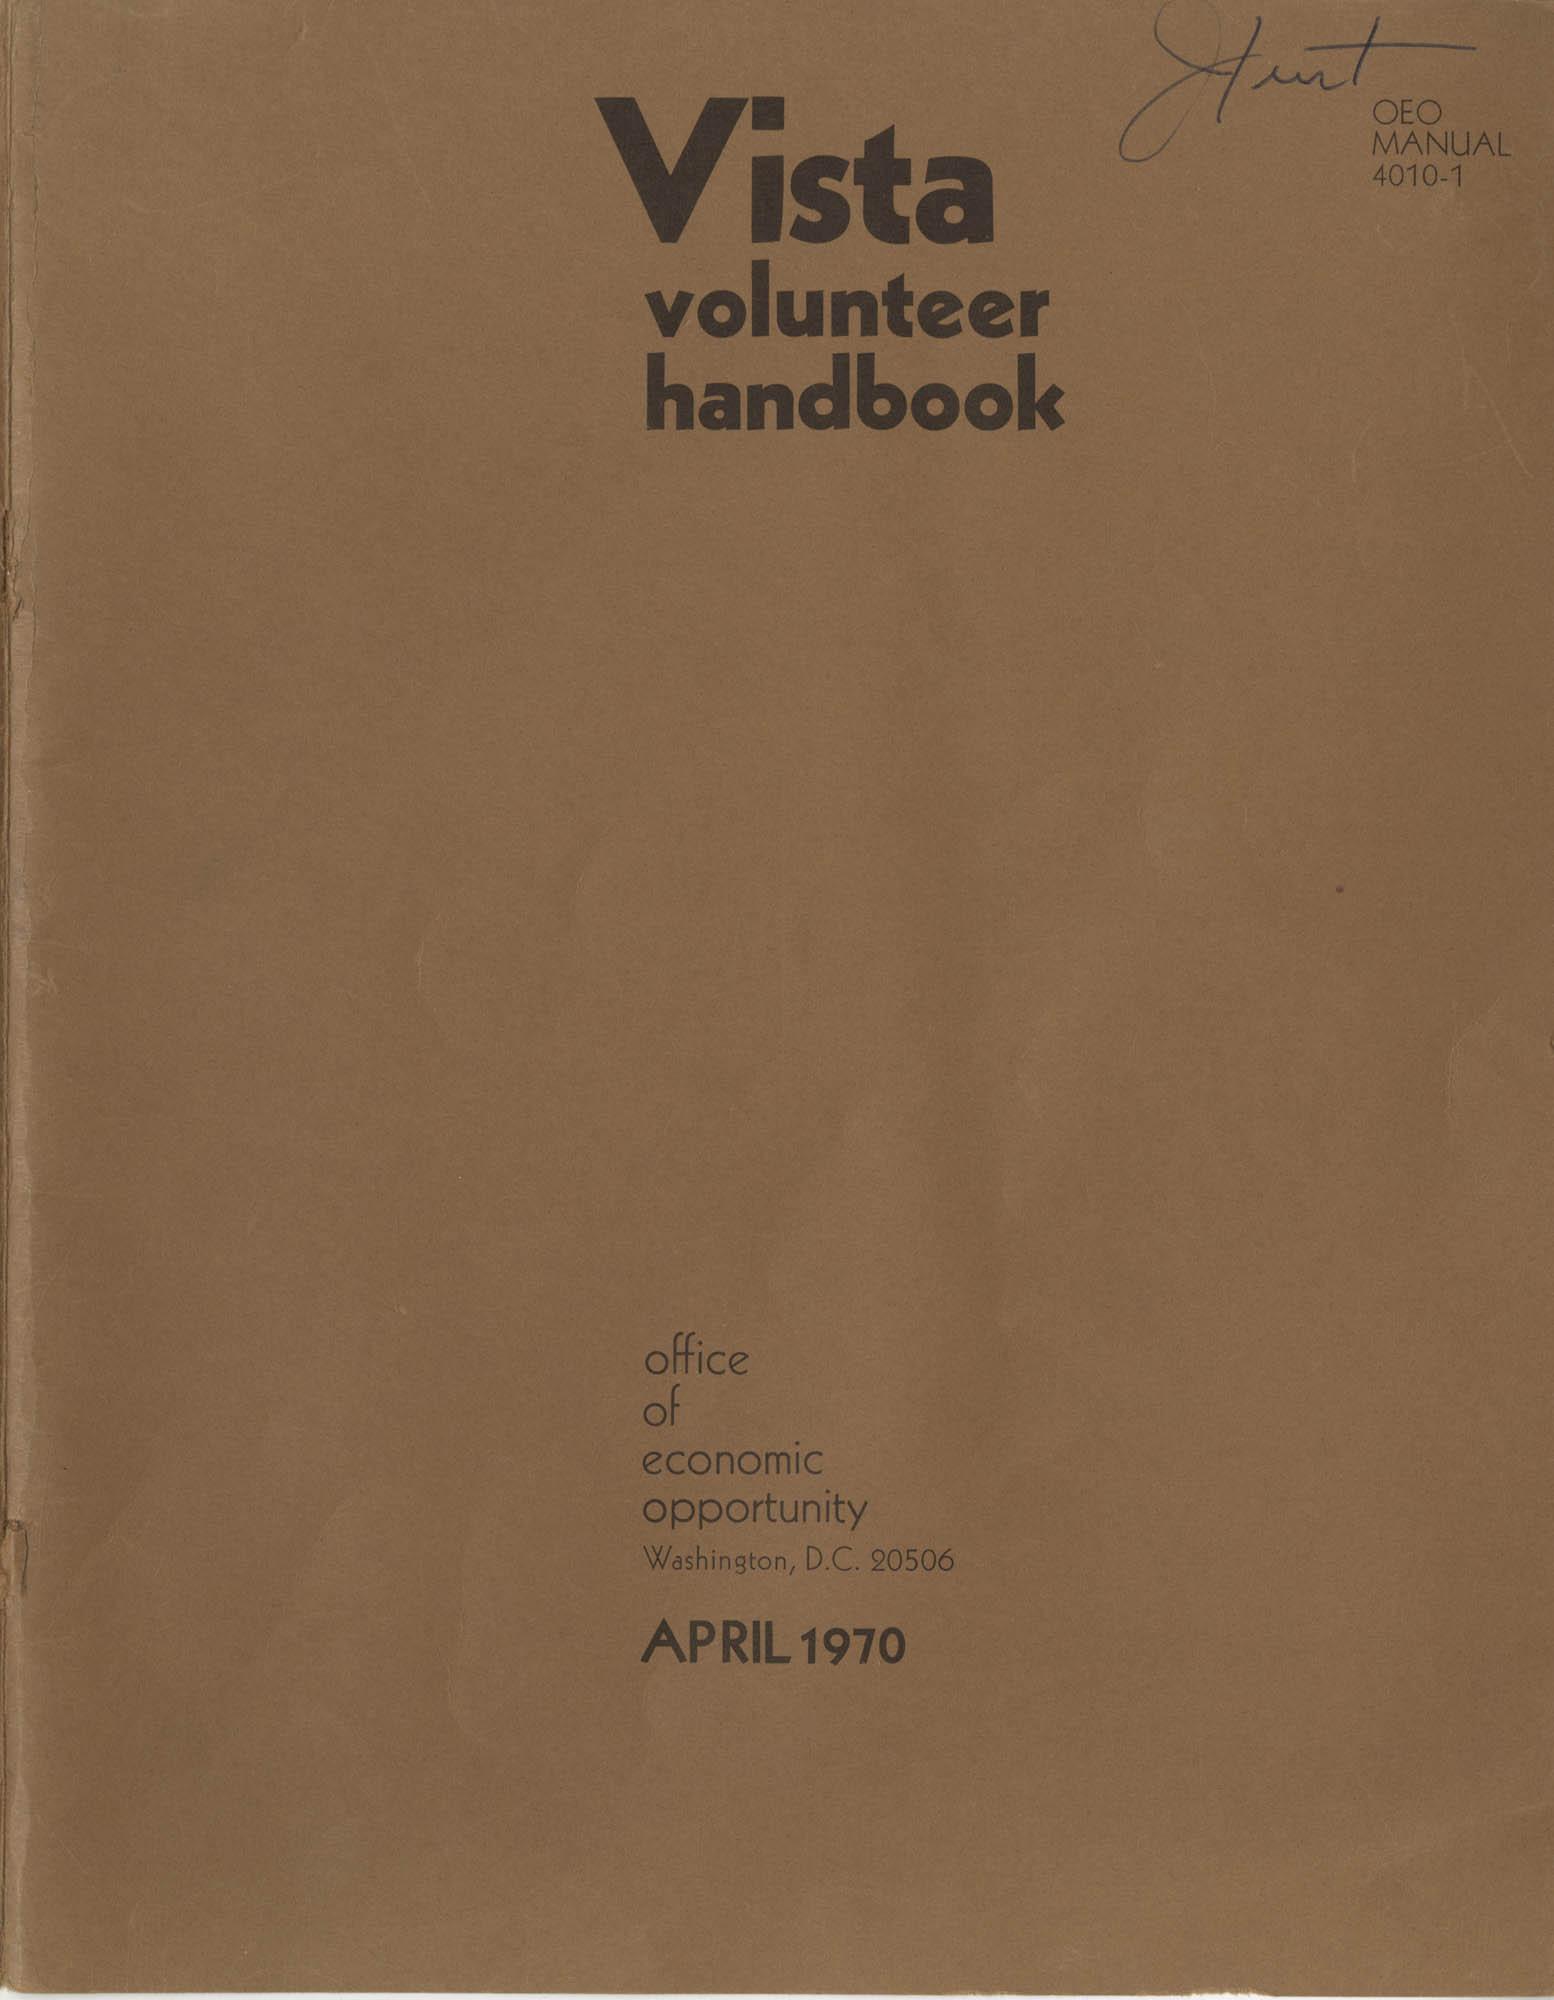 Vista Volunteer Handbook, April 1970, Front Cover Exterior